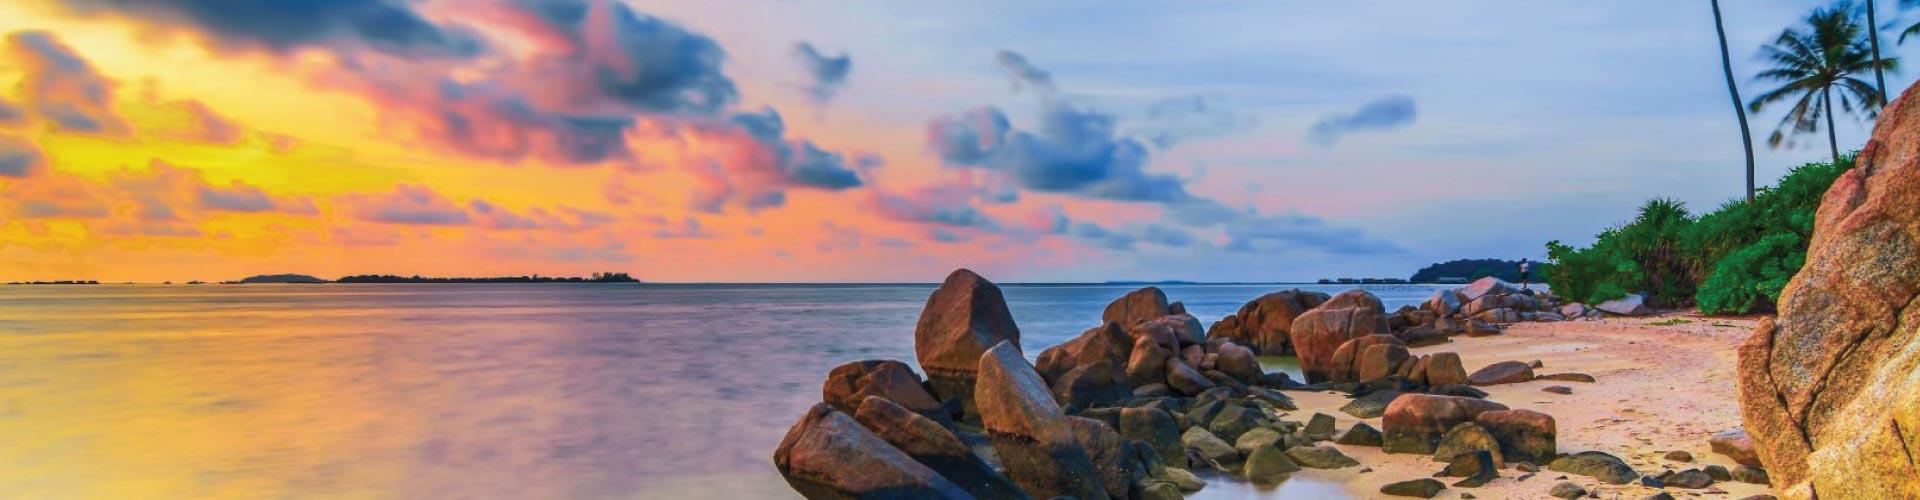 Bintan Island Getaway Cruise (Royal Caribbean)